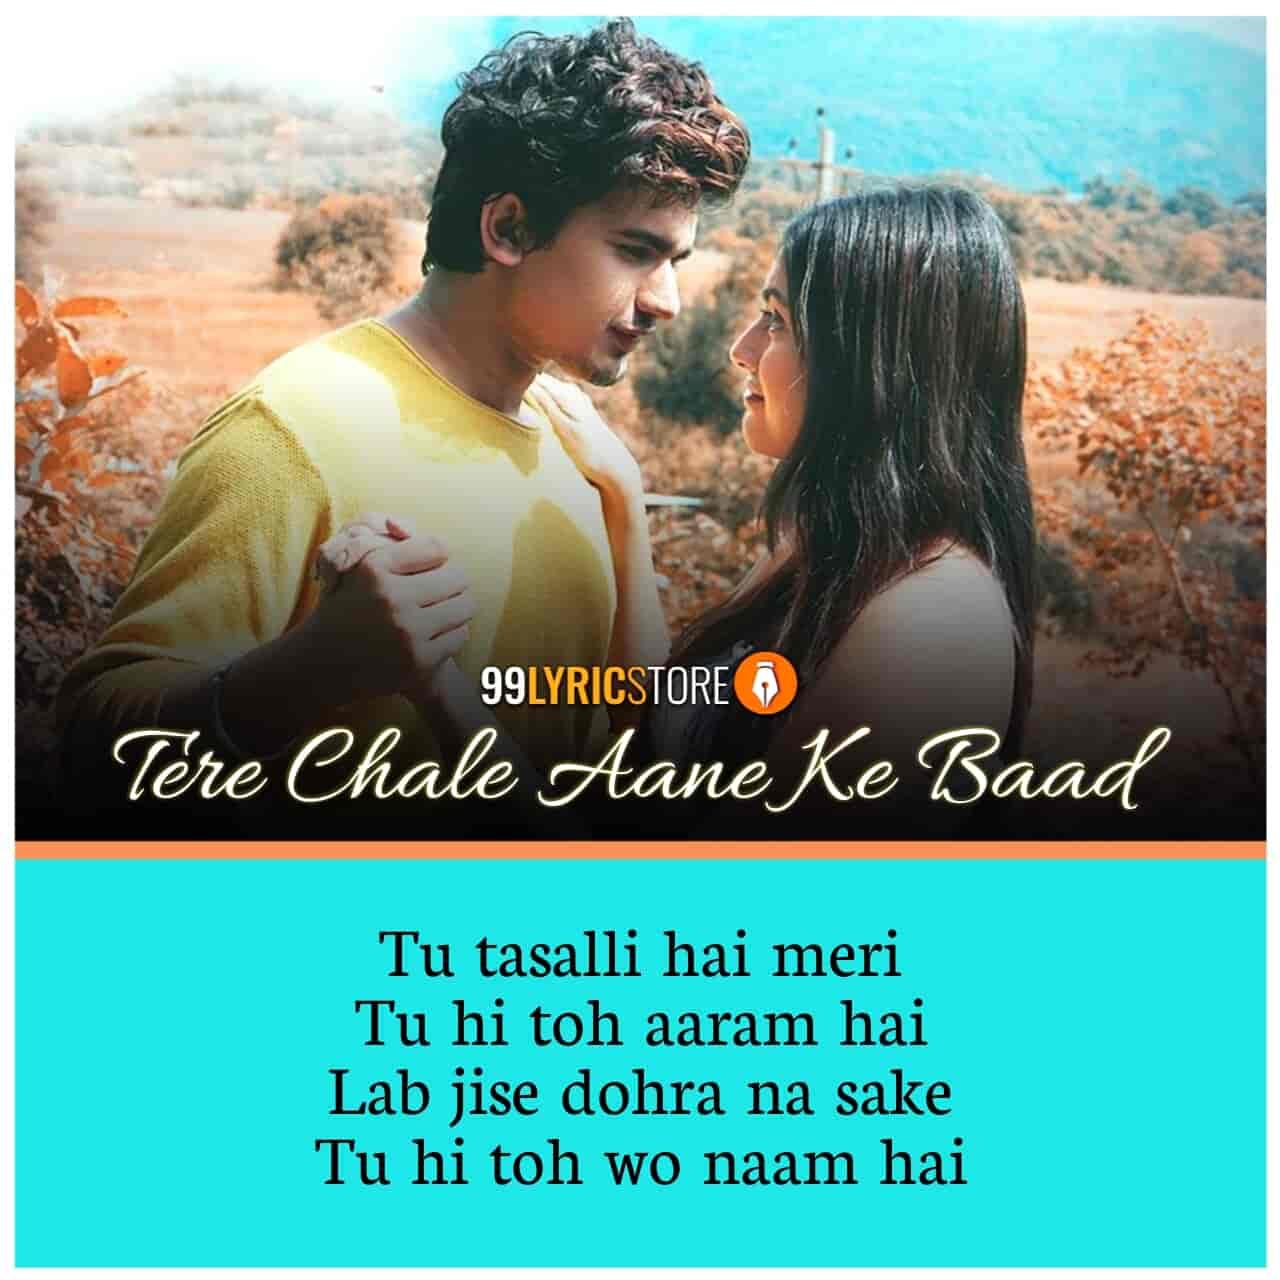 Tere Chale Aane Ke Baad Song Images